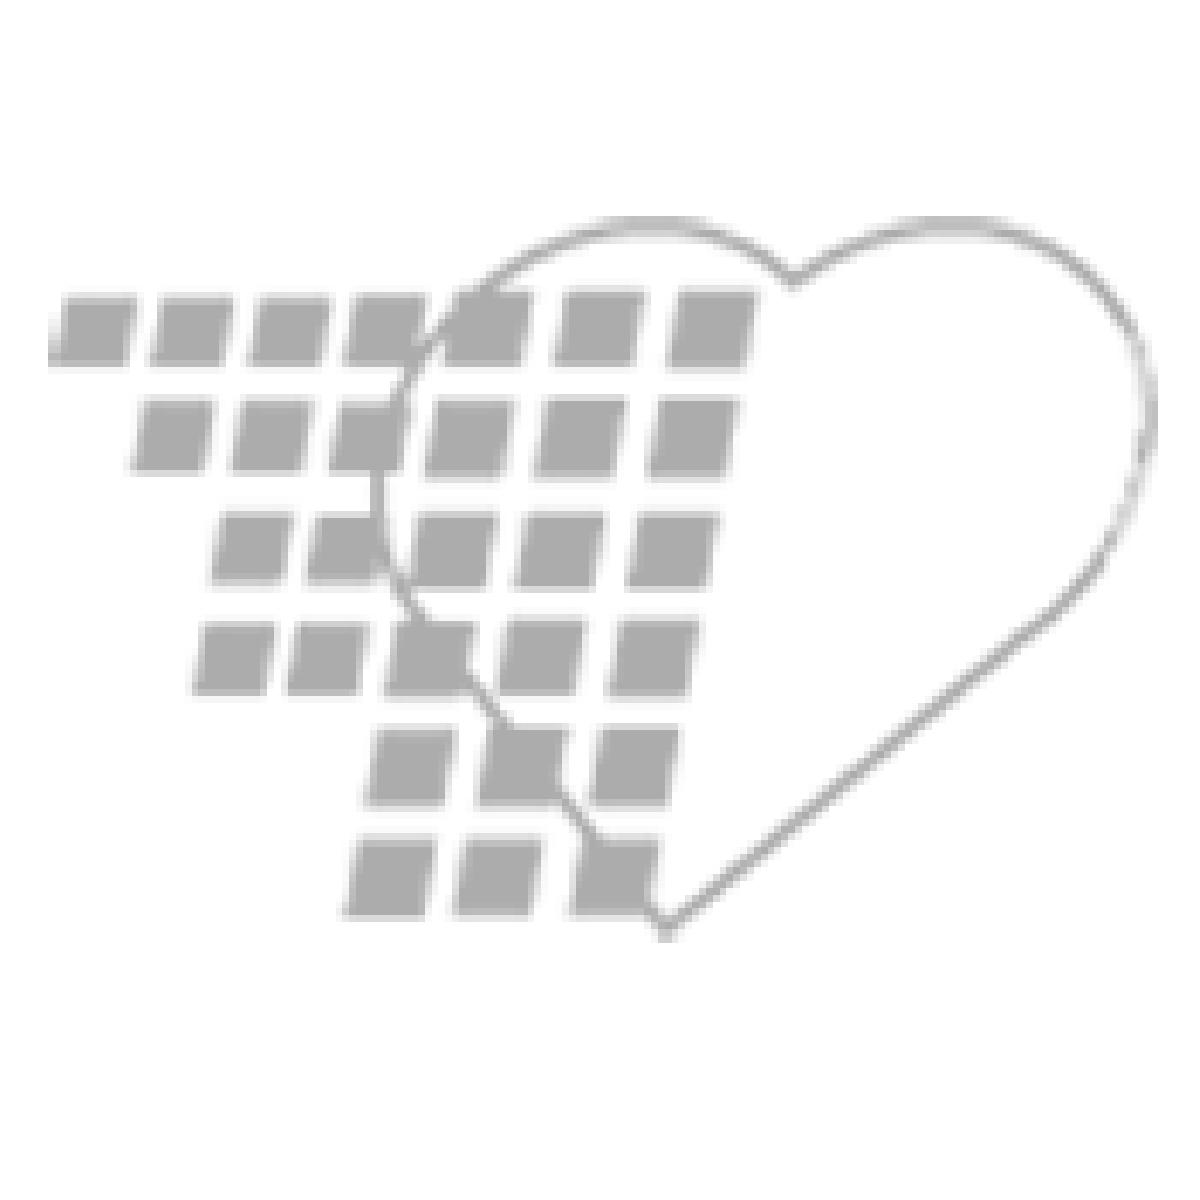 05-44-9825-GRN - Laerdal BaXstrap® Spineboard - Green